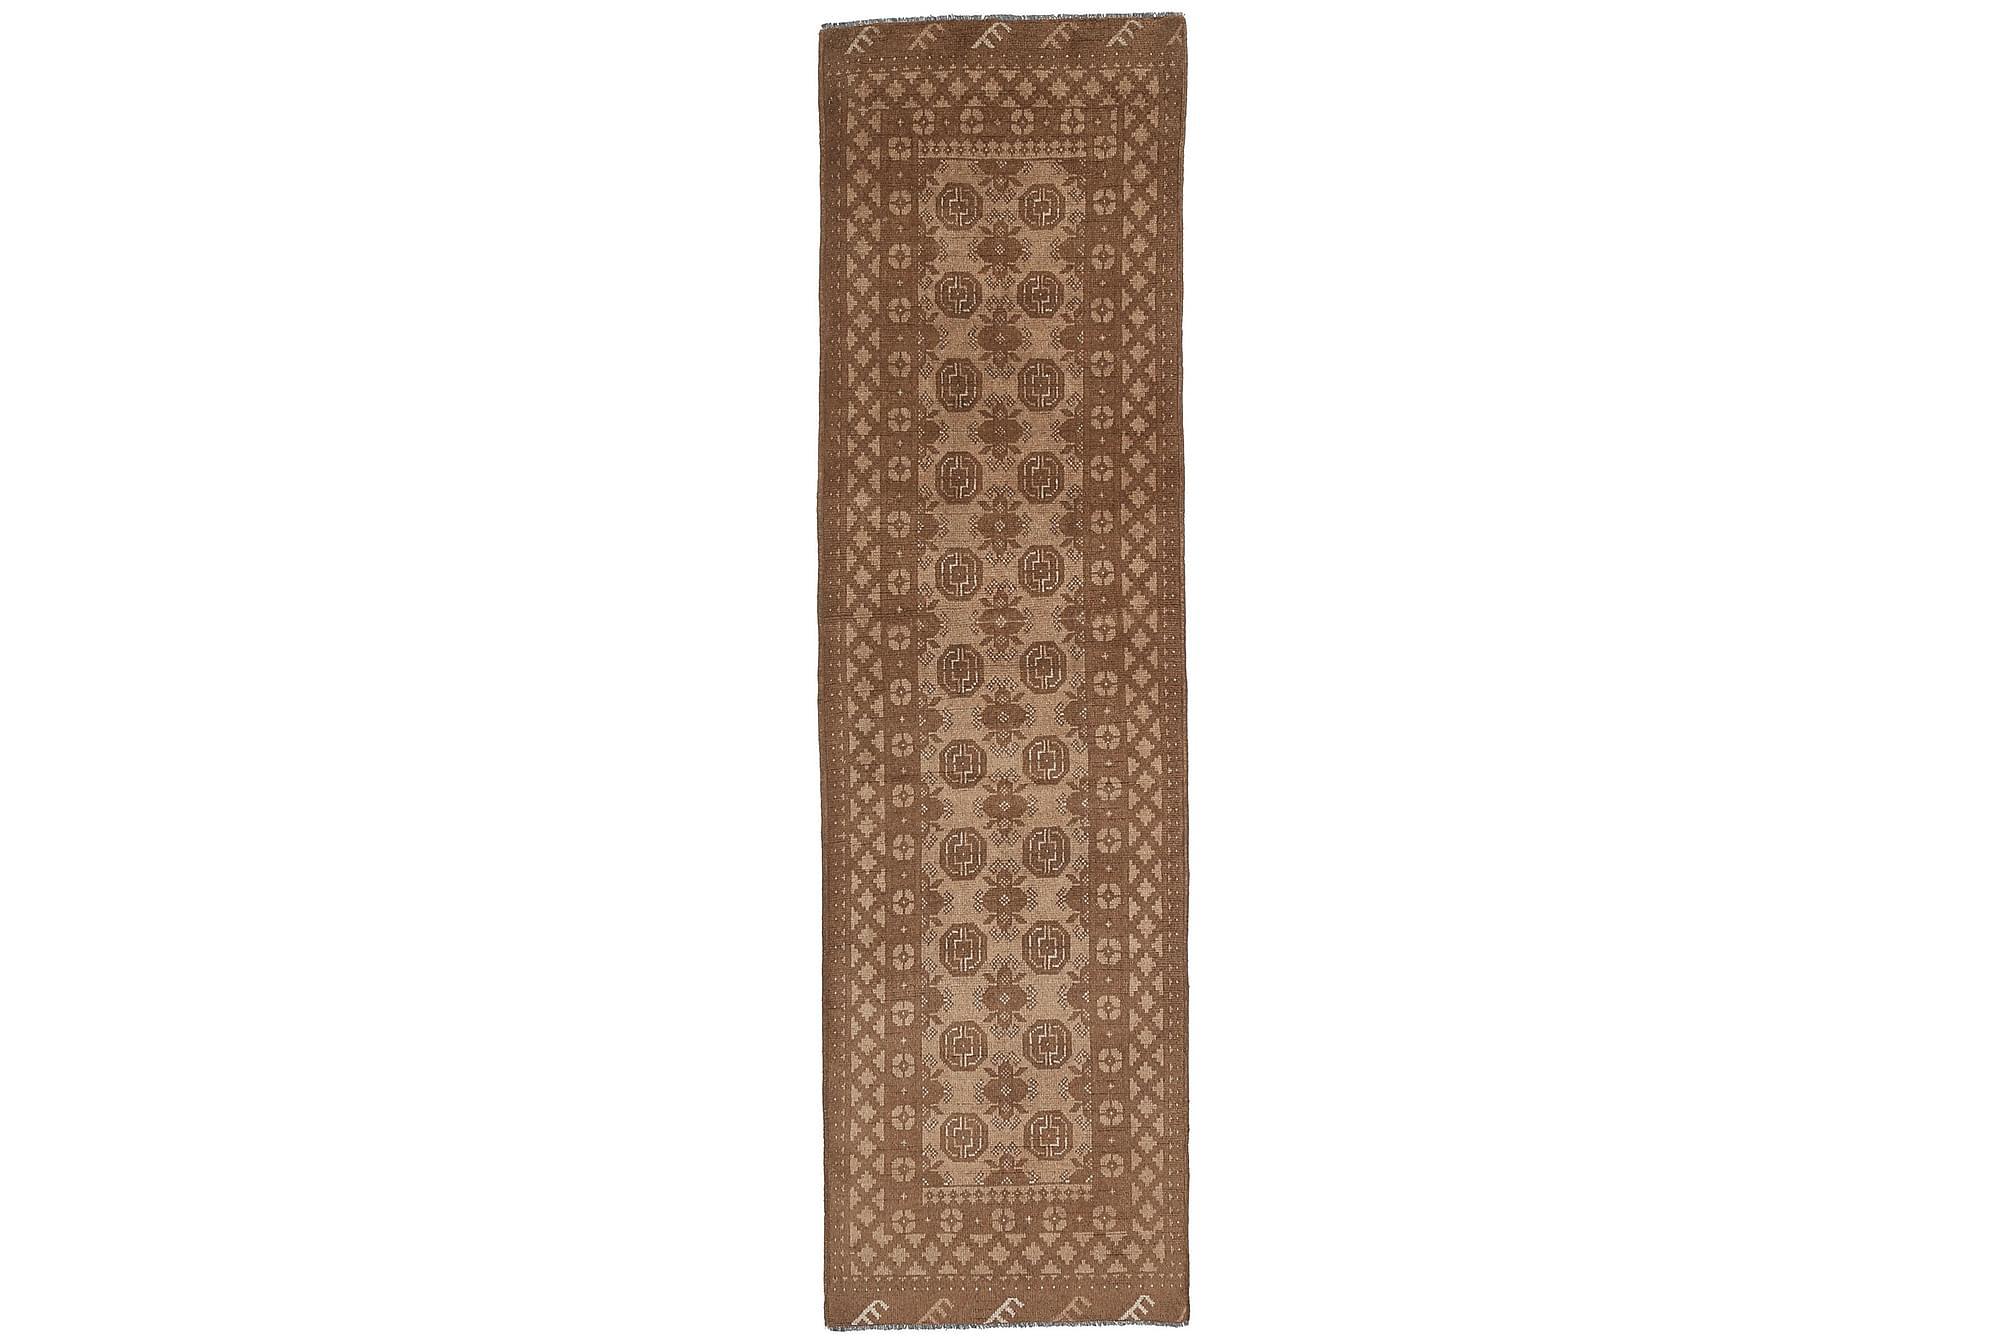 AFGHAN Matta 76x285 Stor Brun, Orientaliska mattor